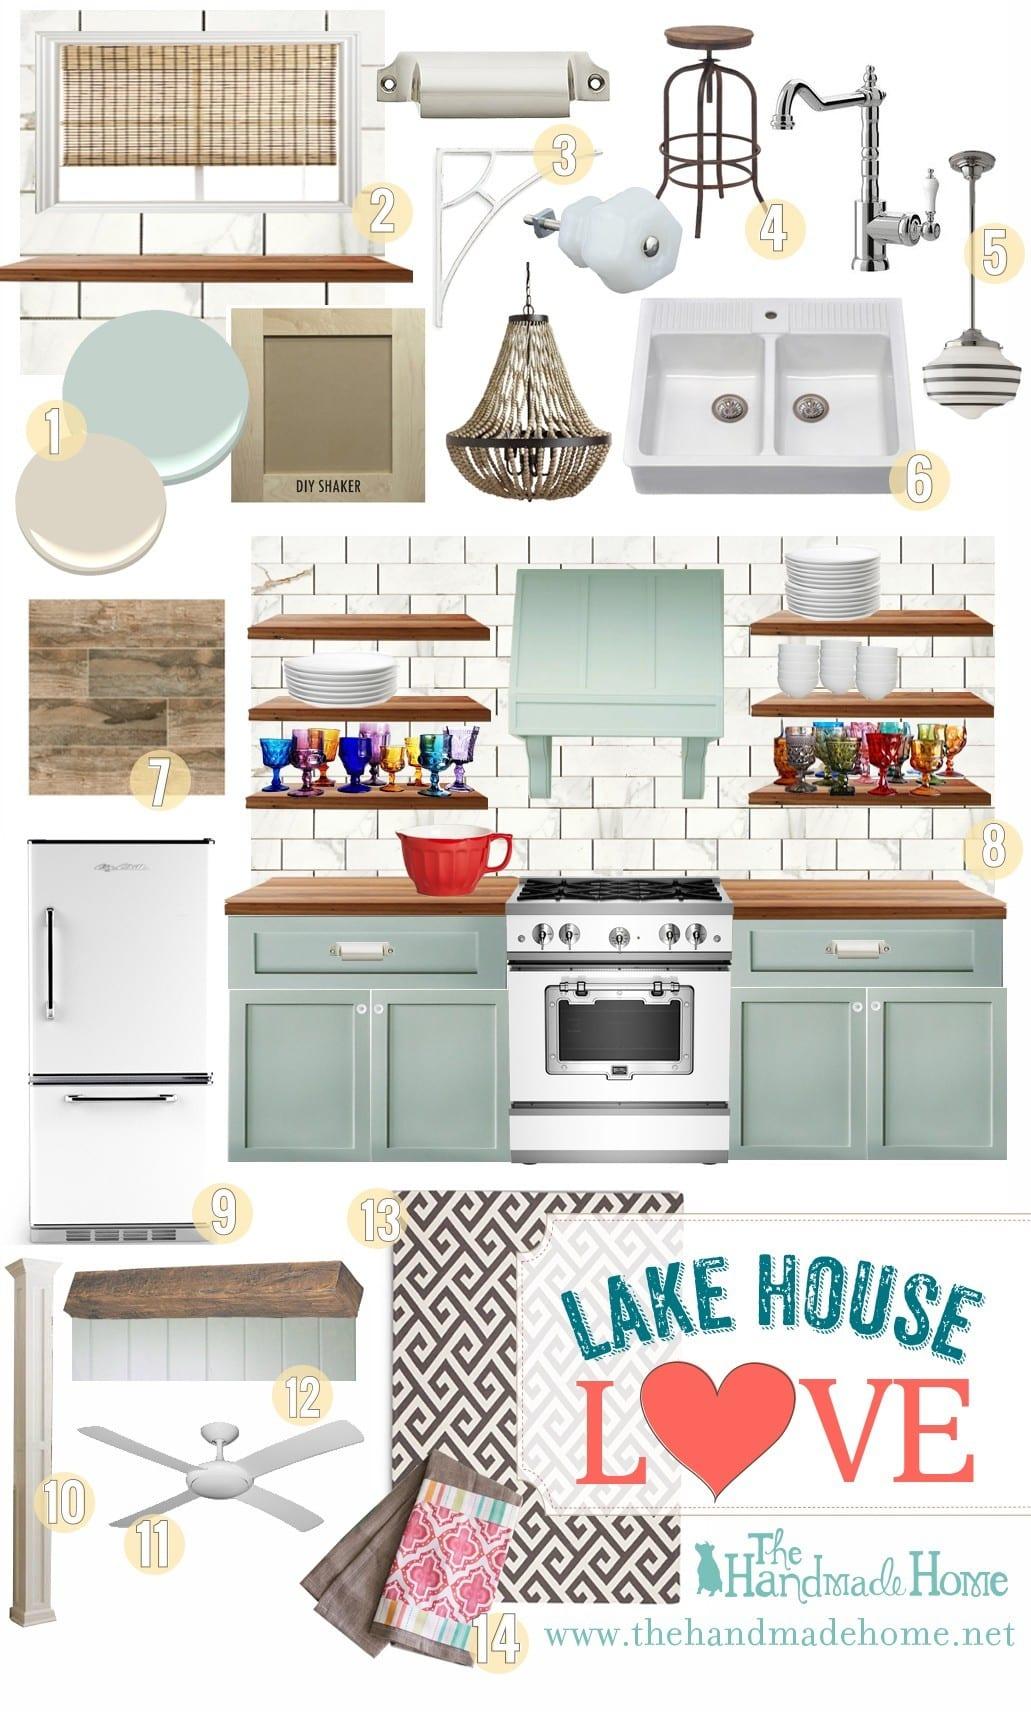 kitchen_lakehouse